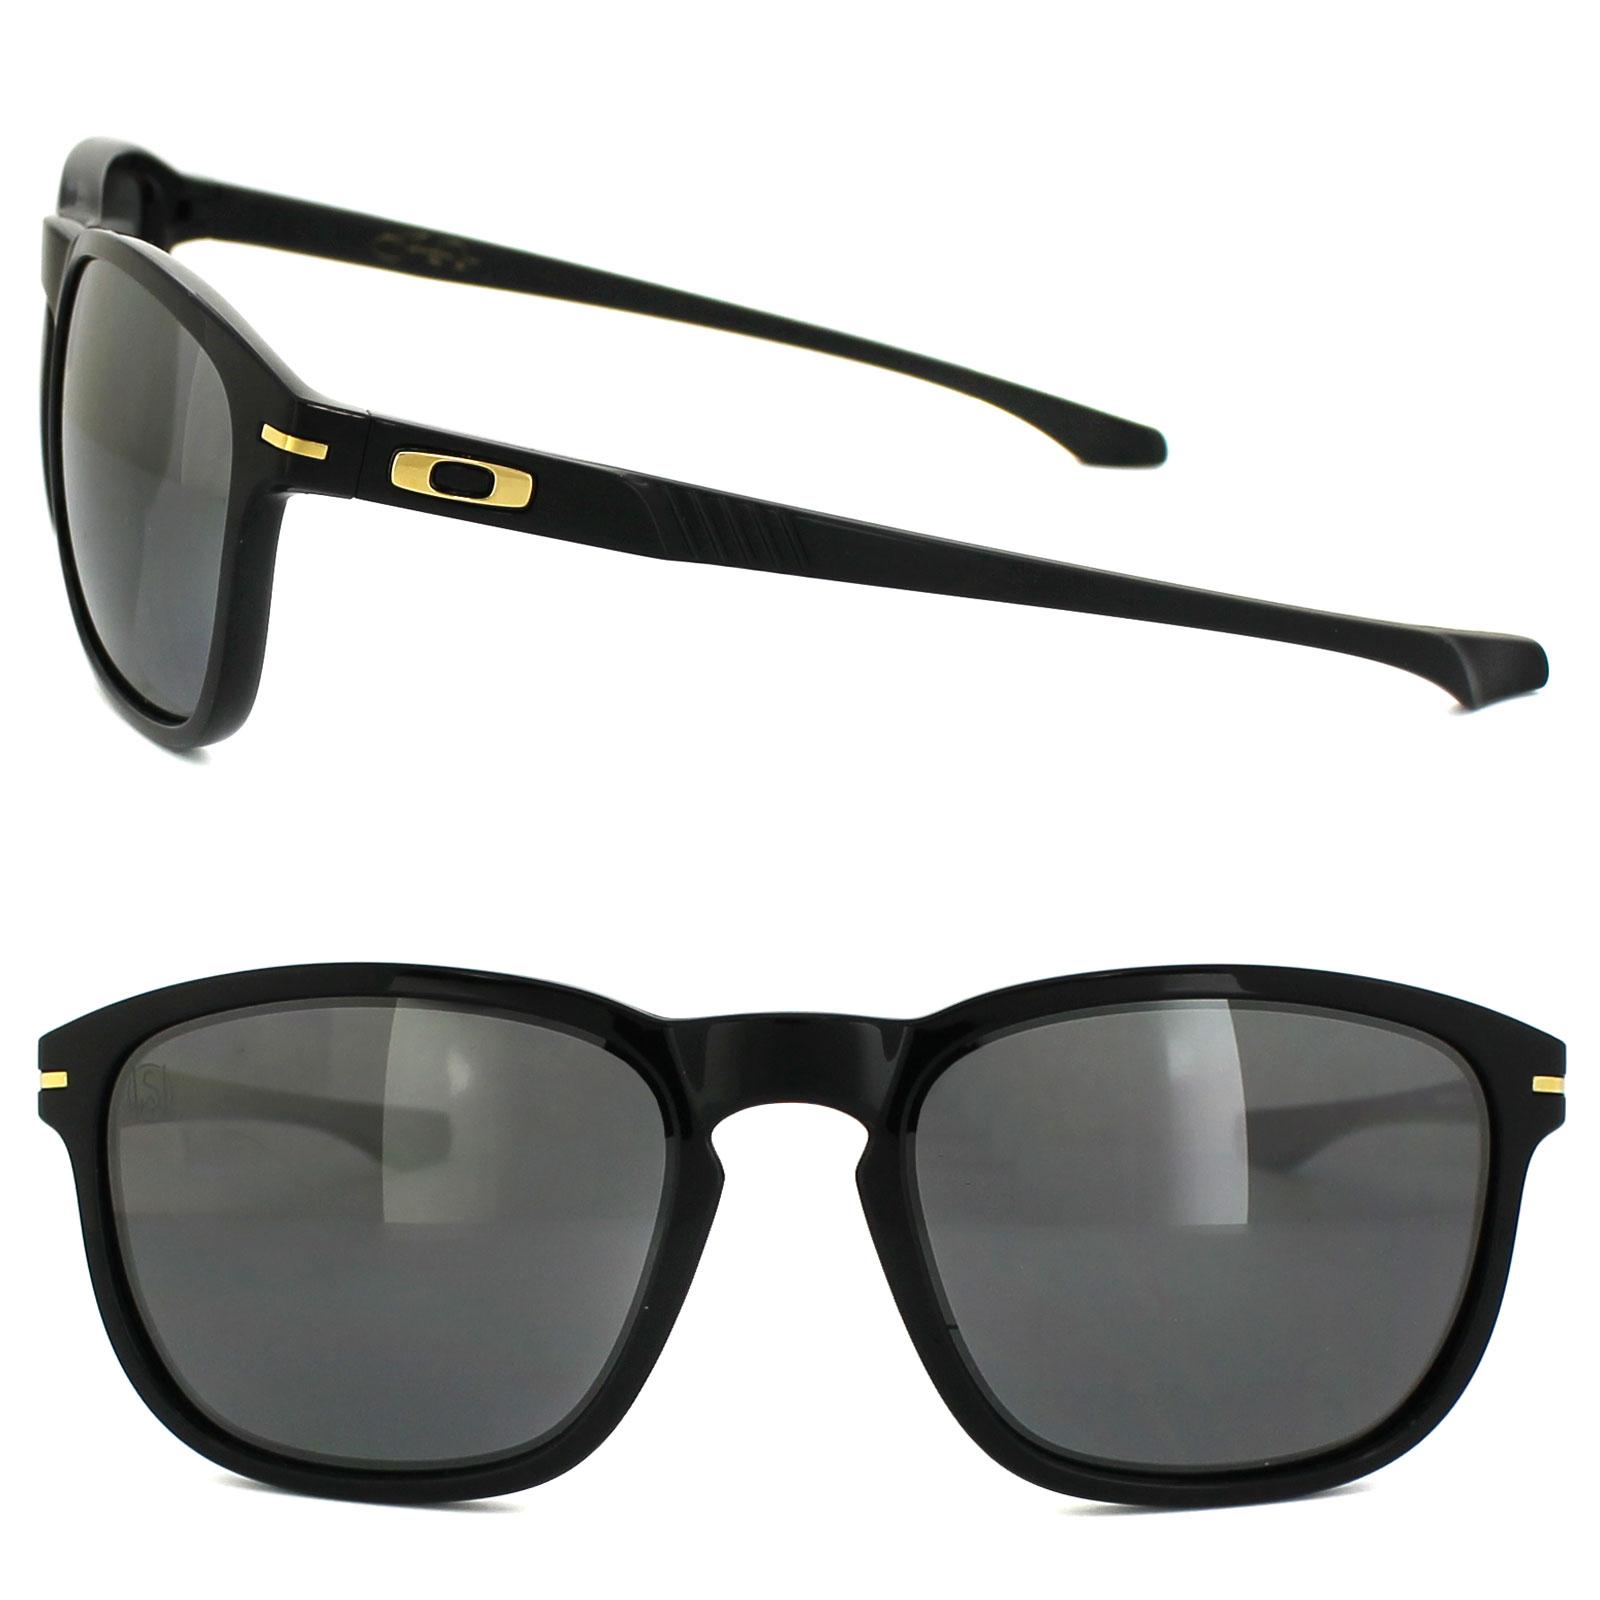 8dbb535e1a2 Sentinel Oakley Sunglasses Enduro OO9223-05 Shaun White Polished Black  Iridium Polarized